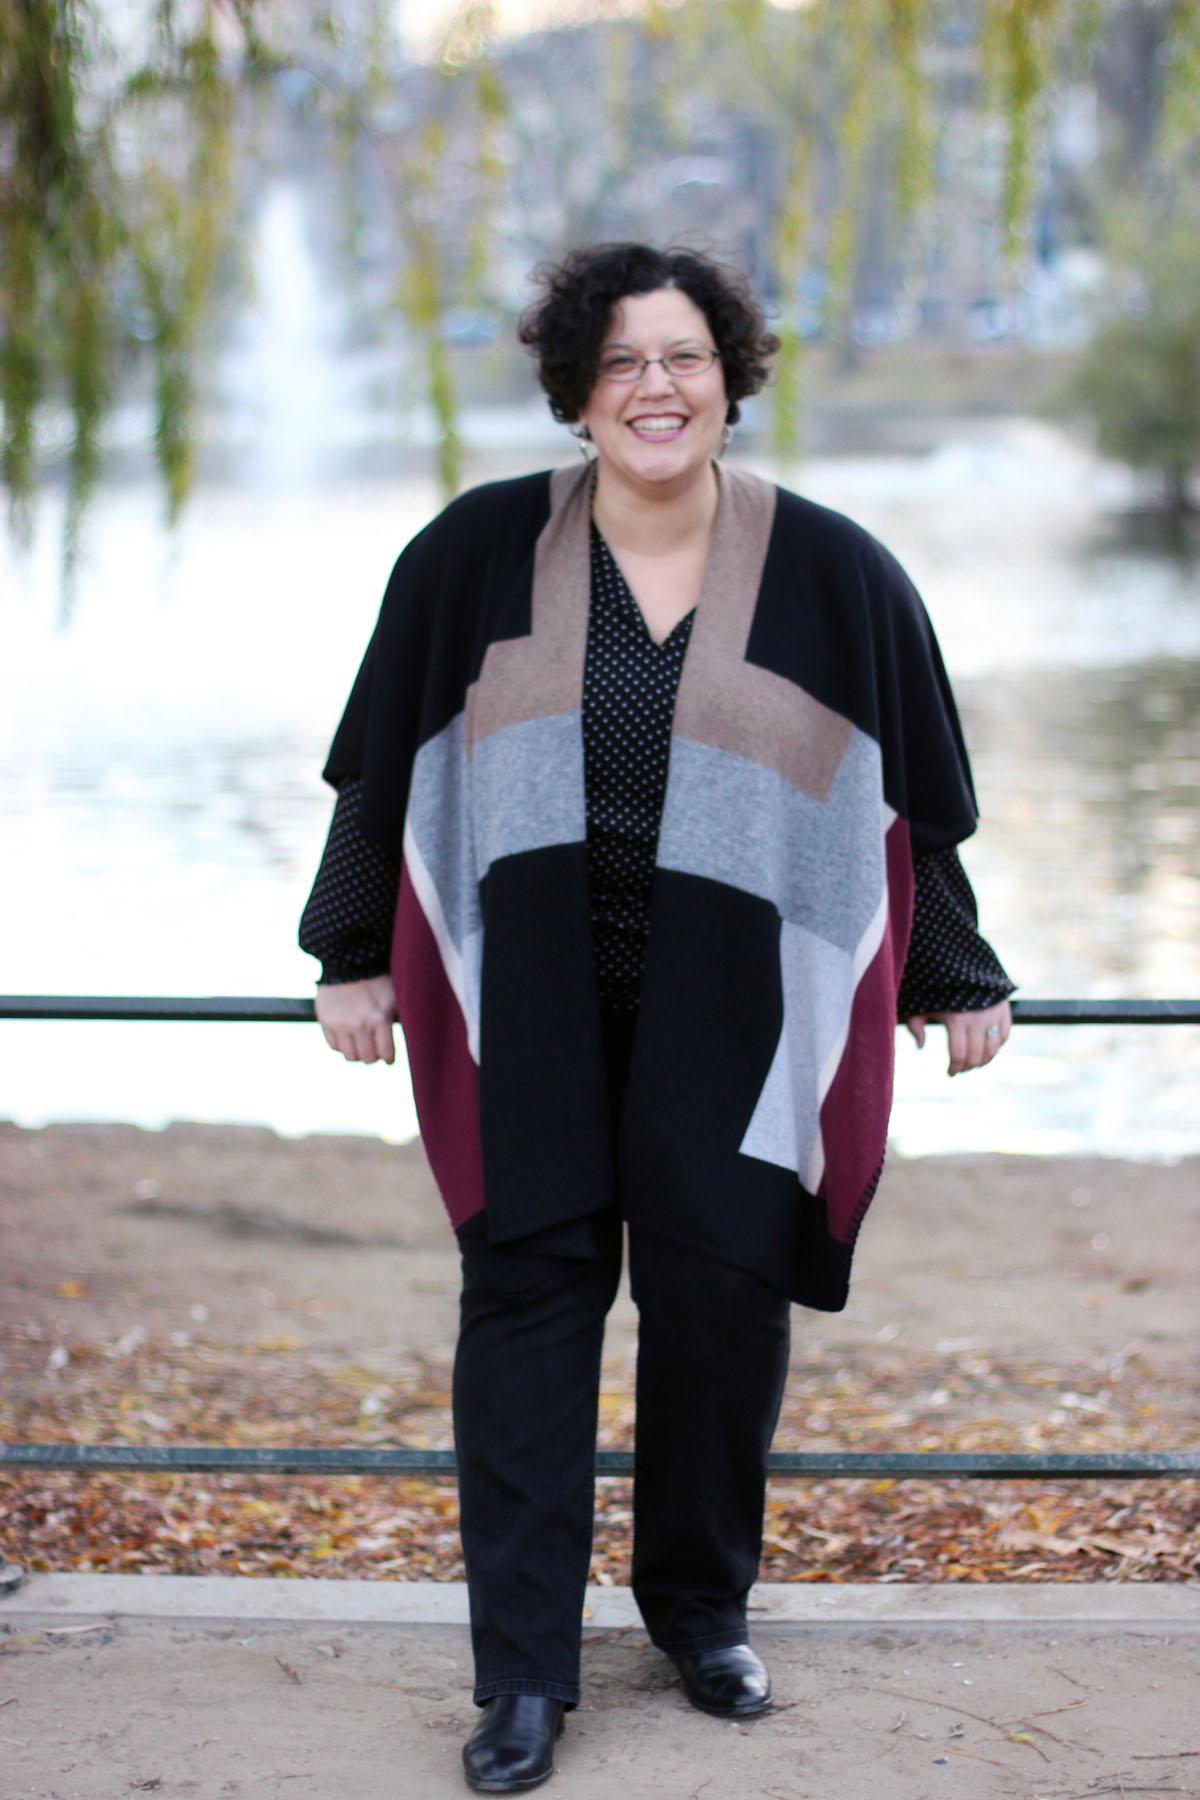 Sheila's Personal Style is Joyful, Elevated, Sharp